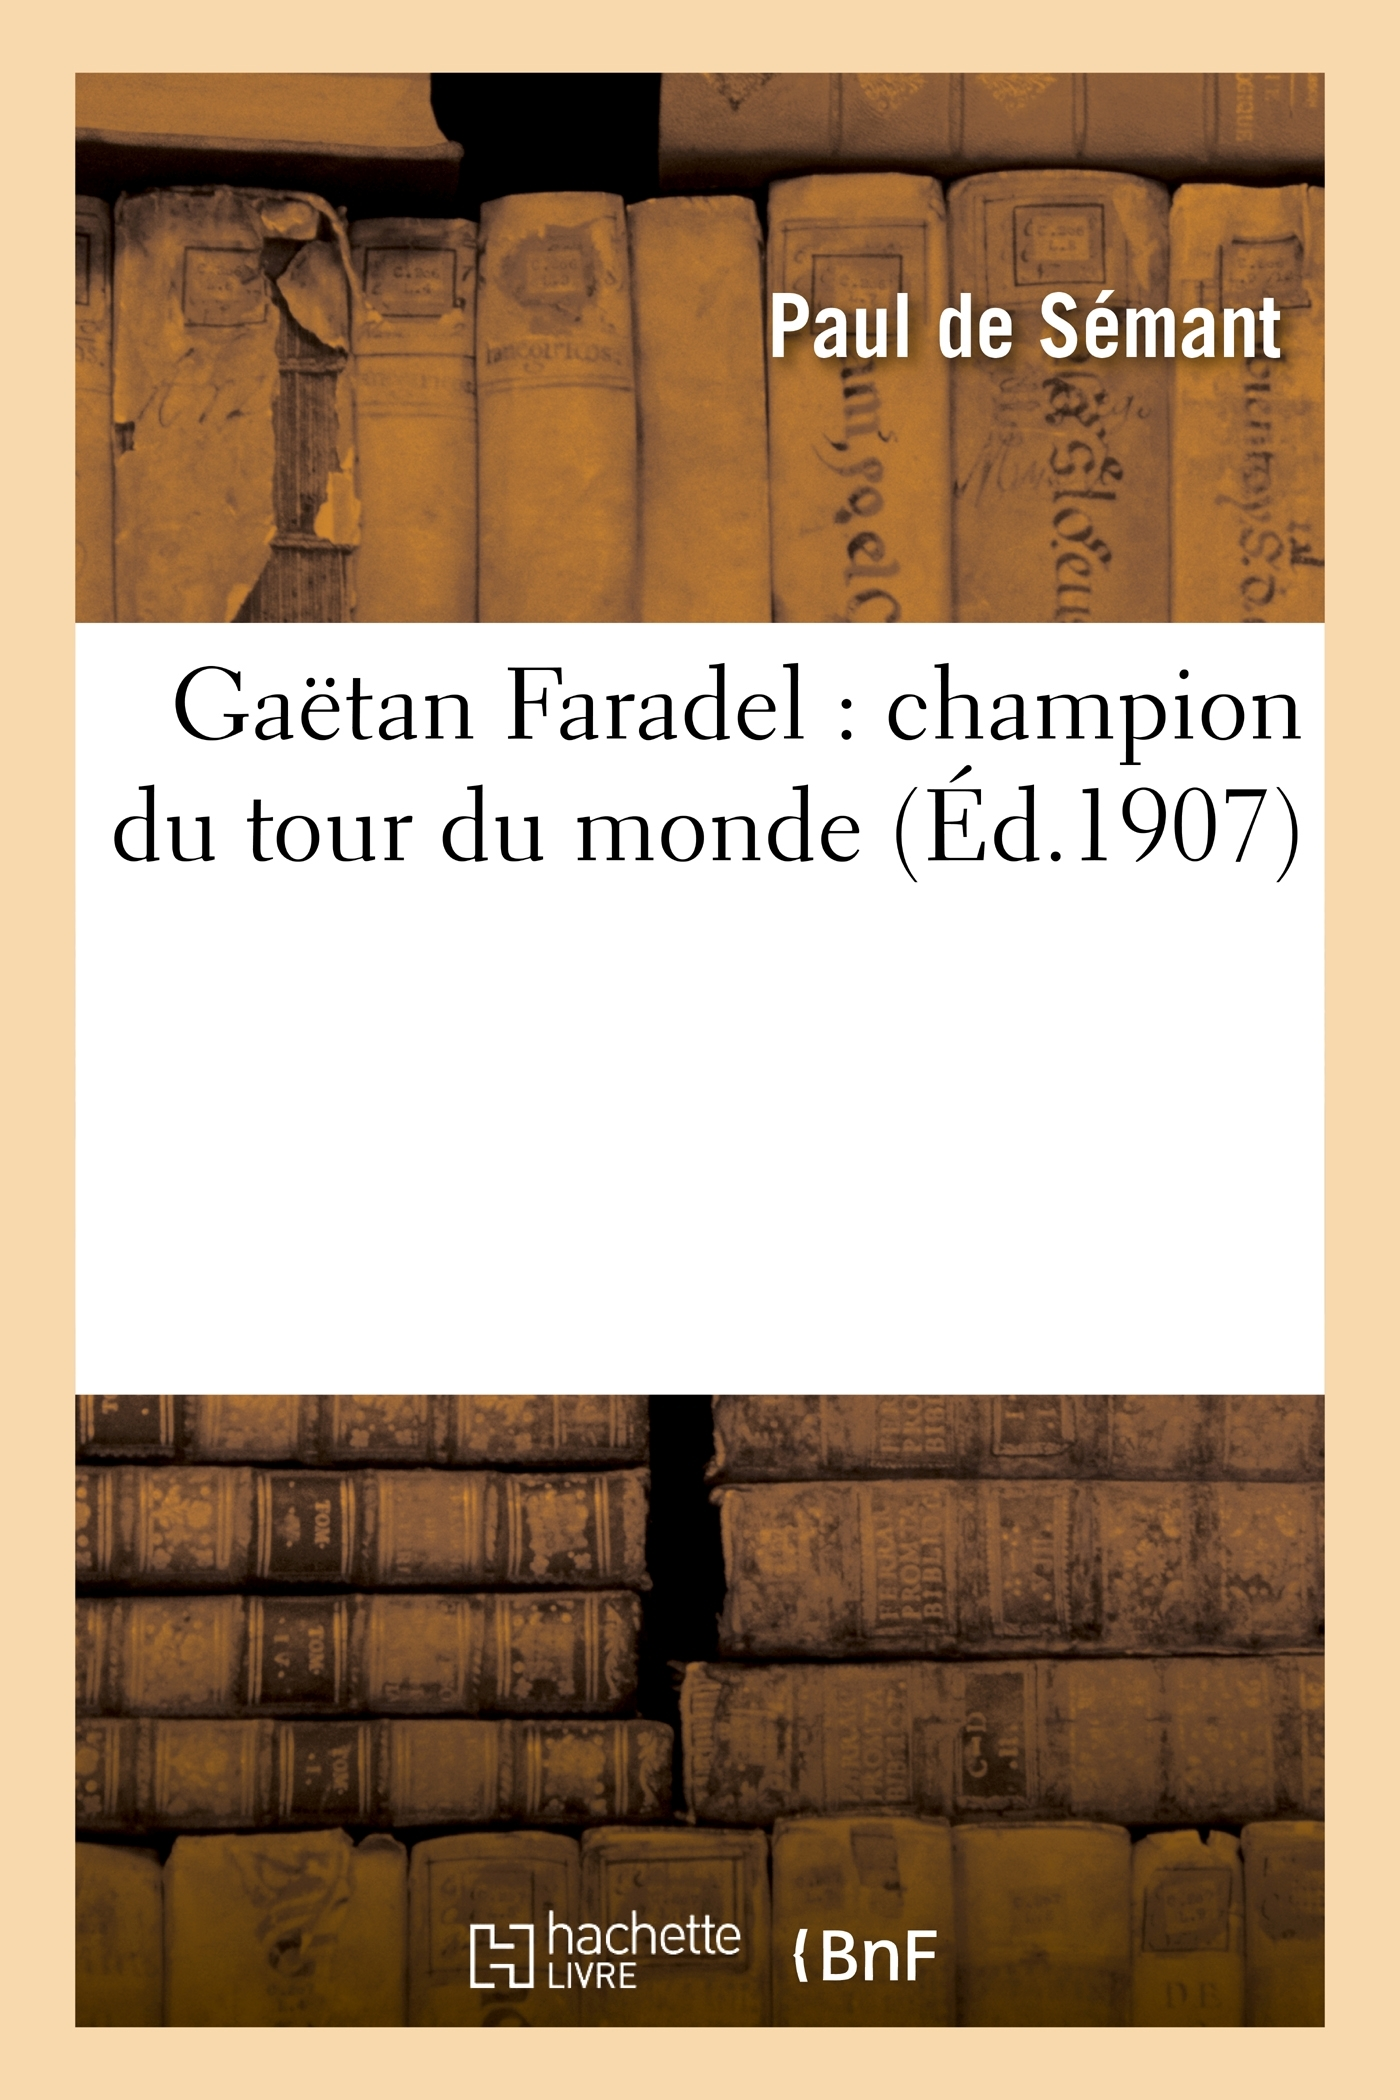 GAETAN FARADEL : CHAMPION DU TOUR DU MONDE